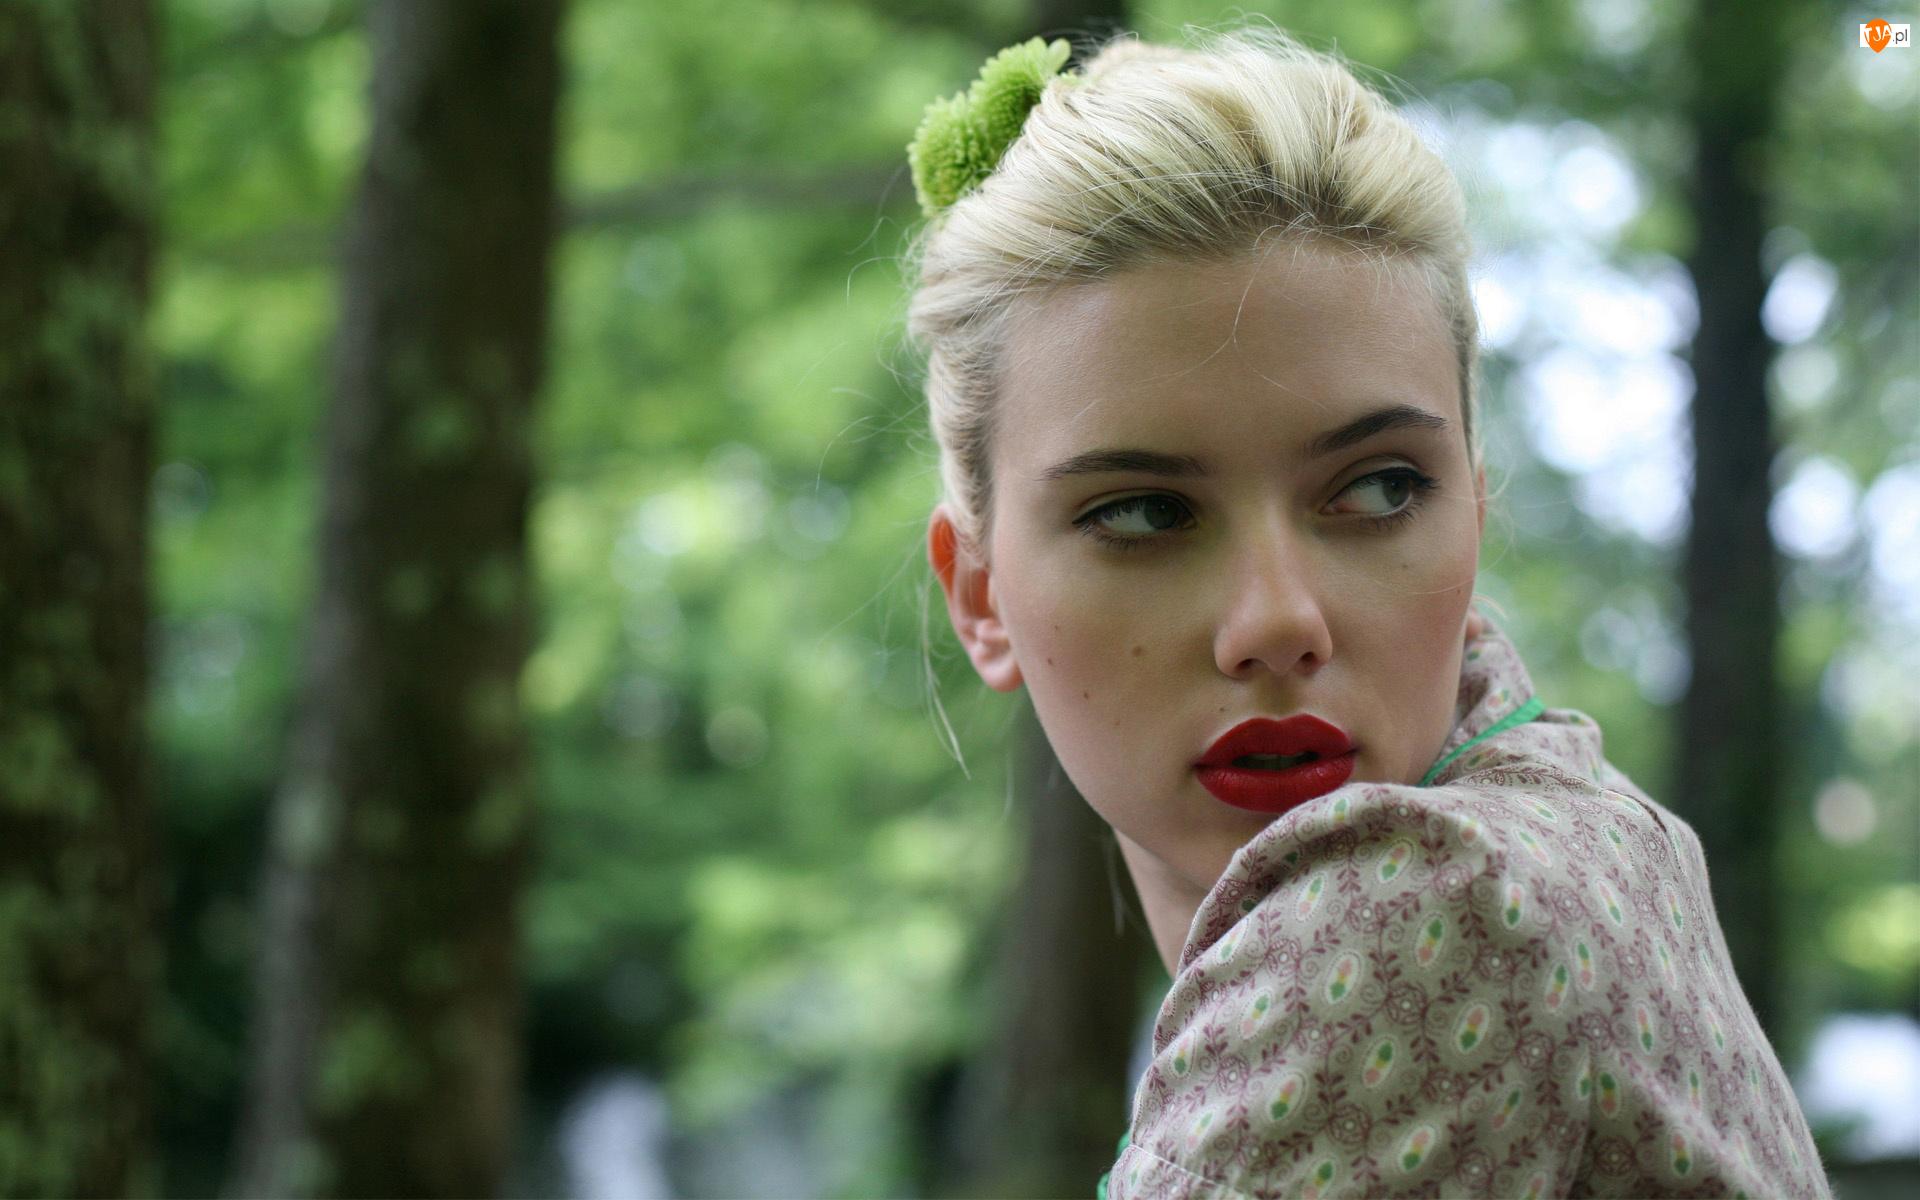 Rozmycie, Scarlett, Johansson